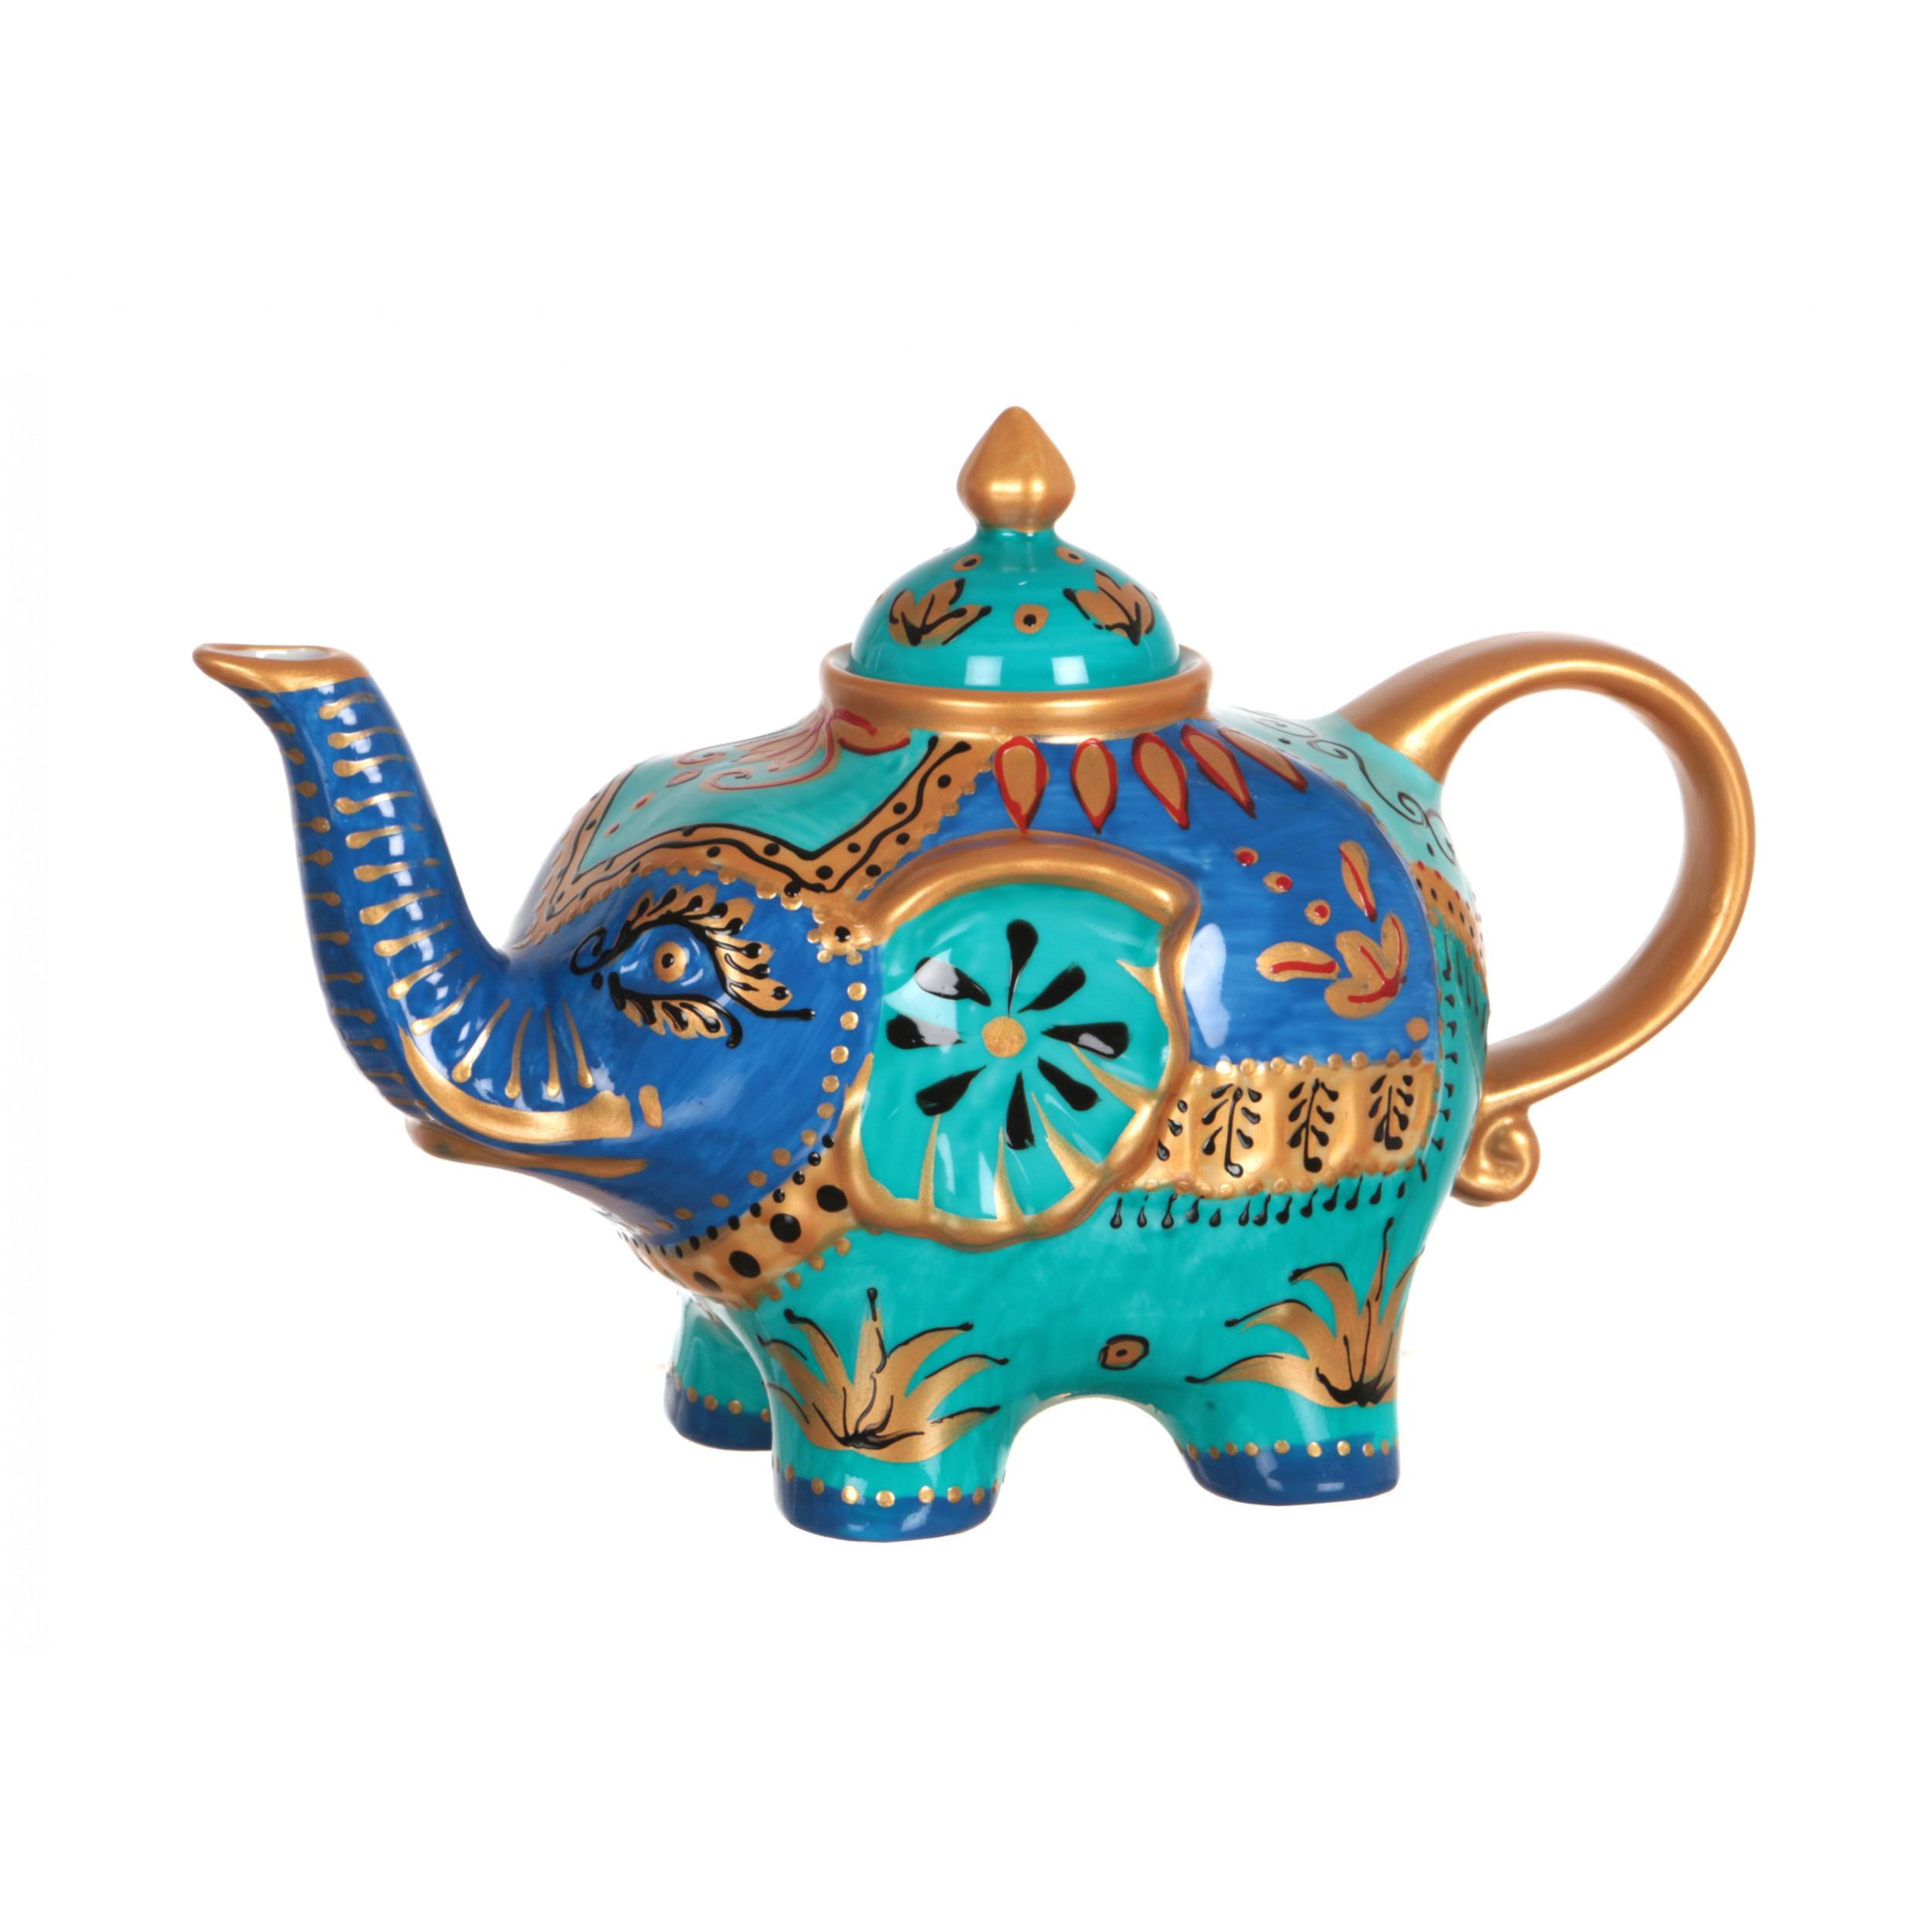 {} Lefard Заварочный чайник Слон (800 мл) чайник заварочный santoro london the hatter цвет белый черный 800 мл